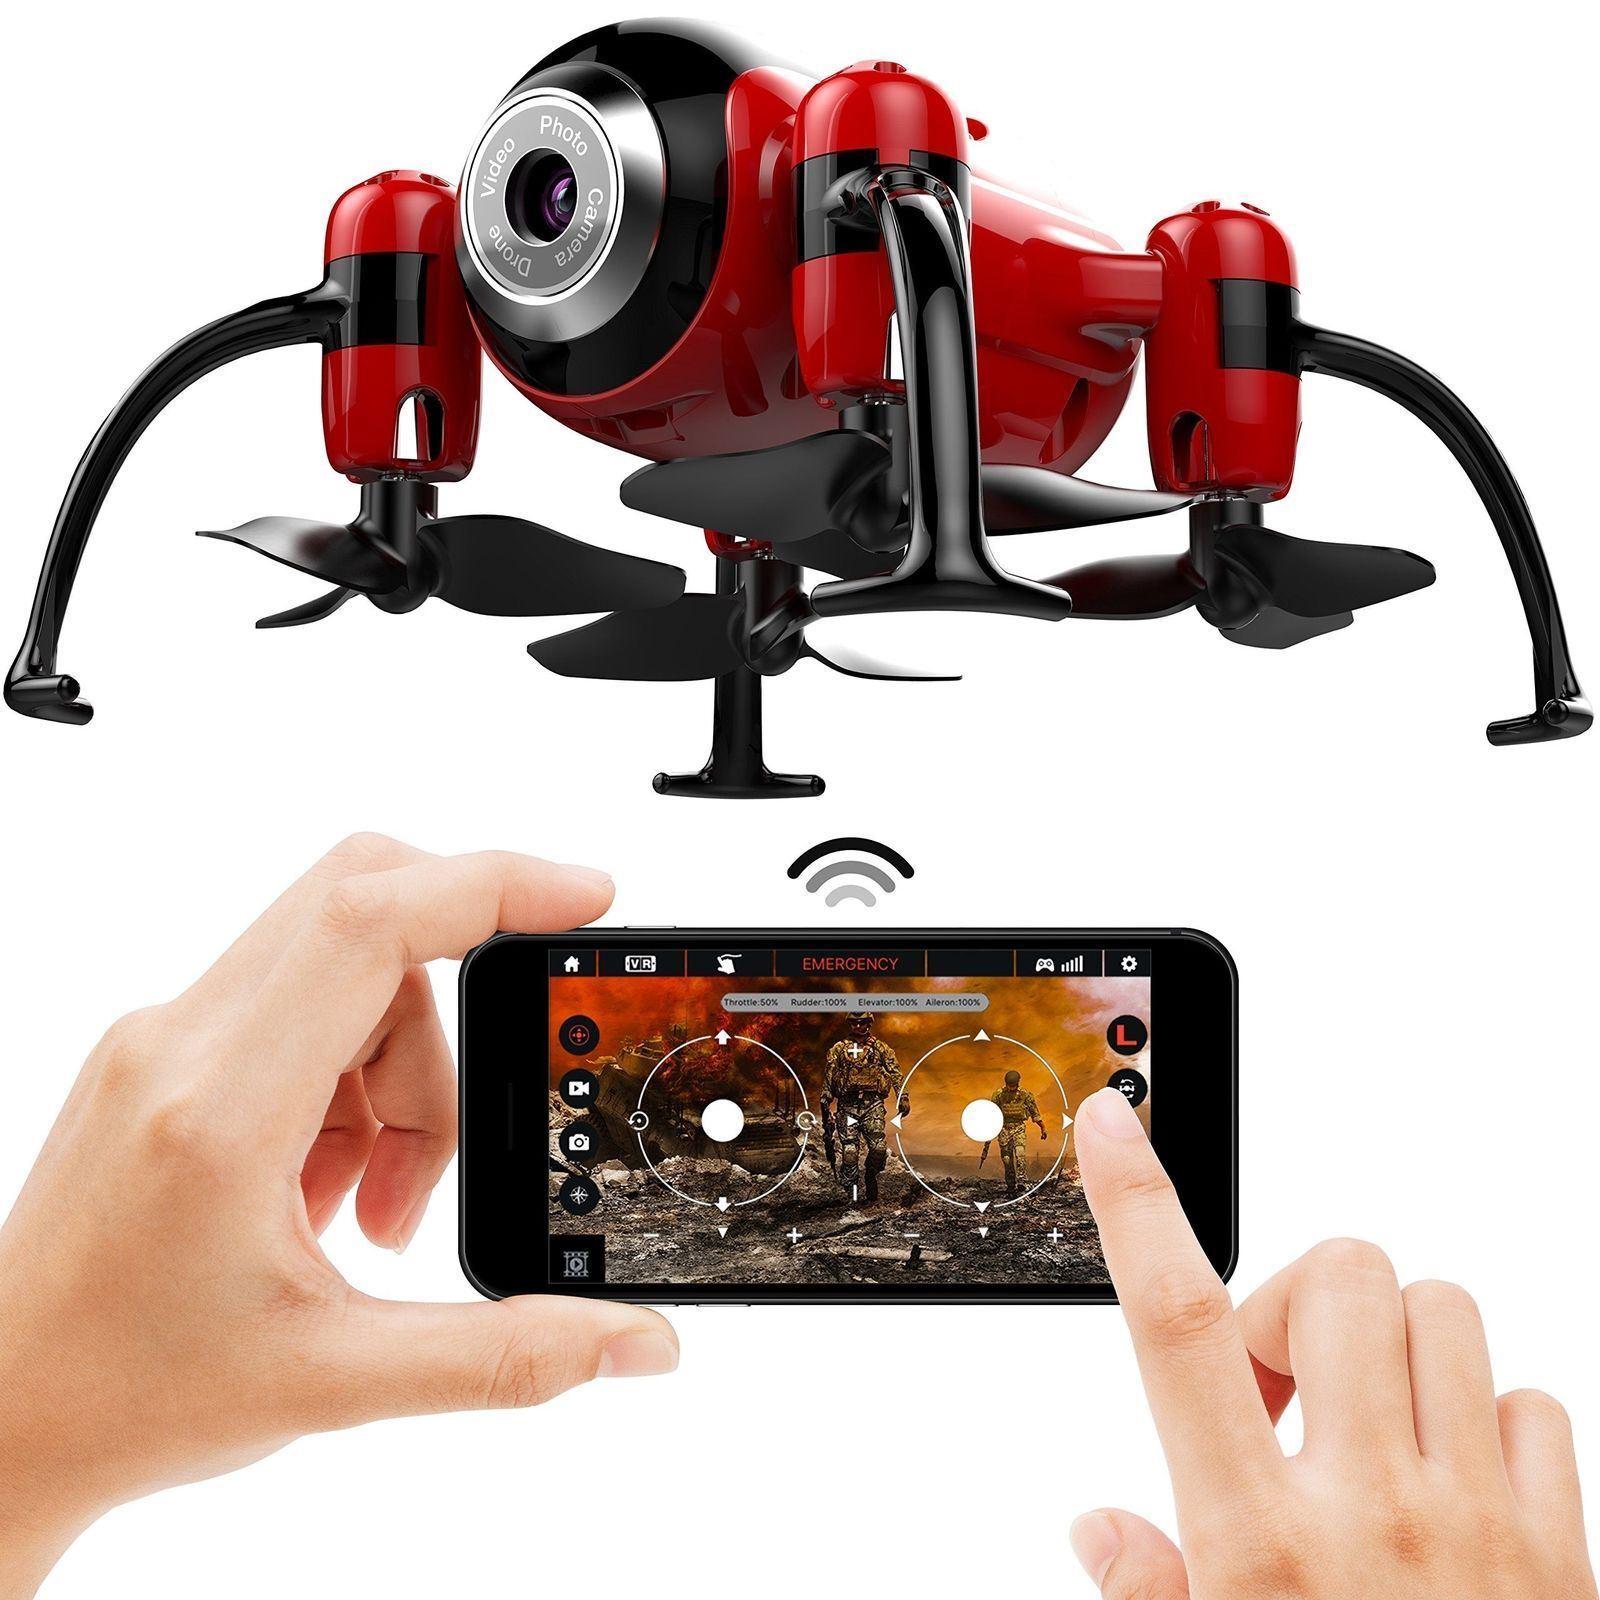 röd Mini Drone Quadcopter med Camera Video Stream, Altitude Hold, Headless Mode